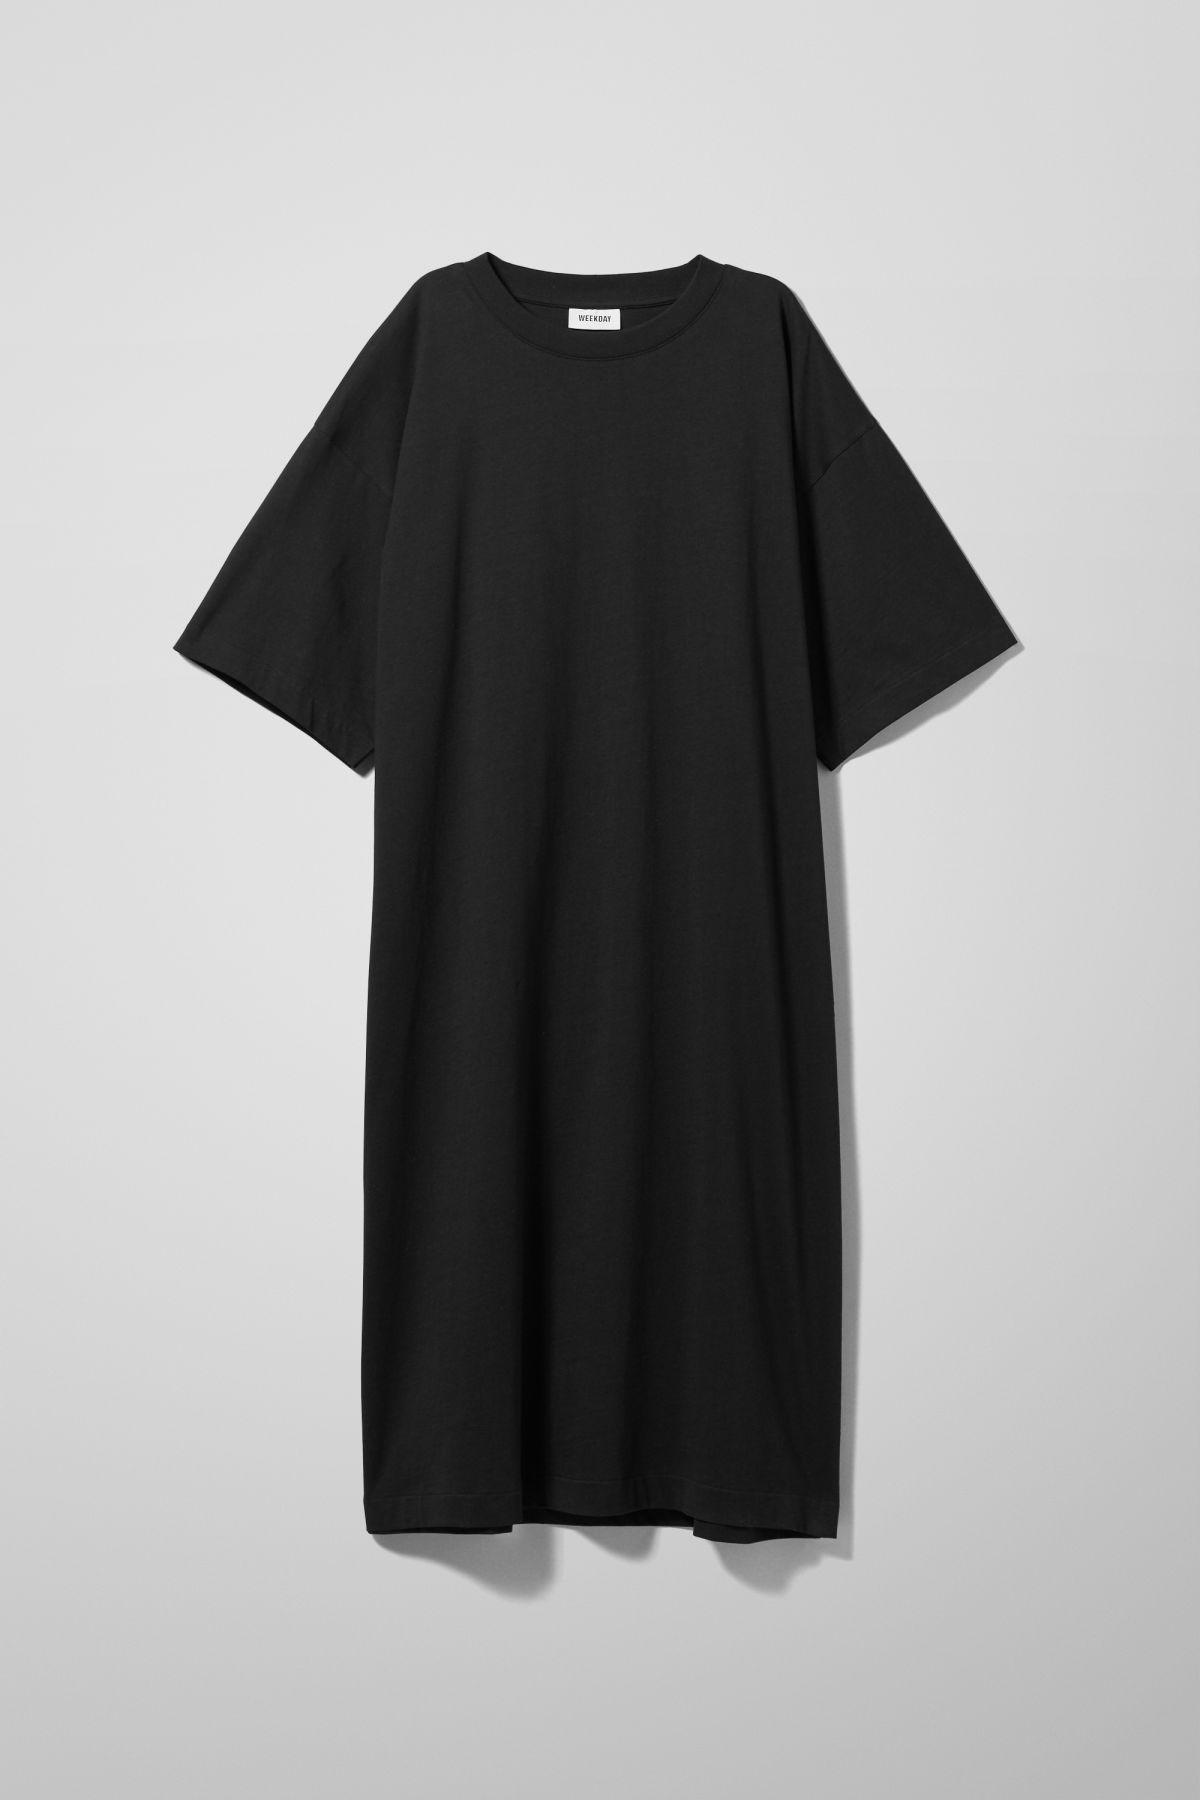 Image of Ines T-Shirt Dress - Black-M